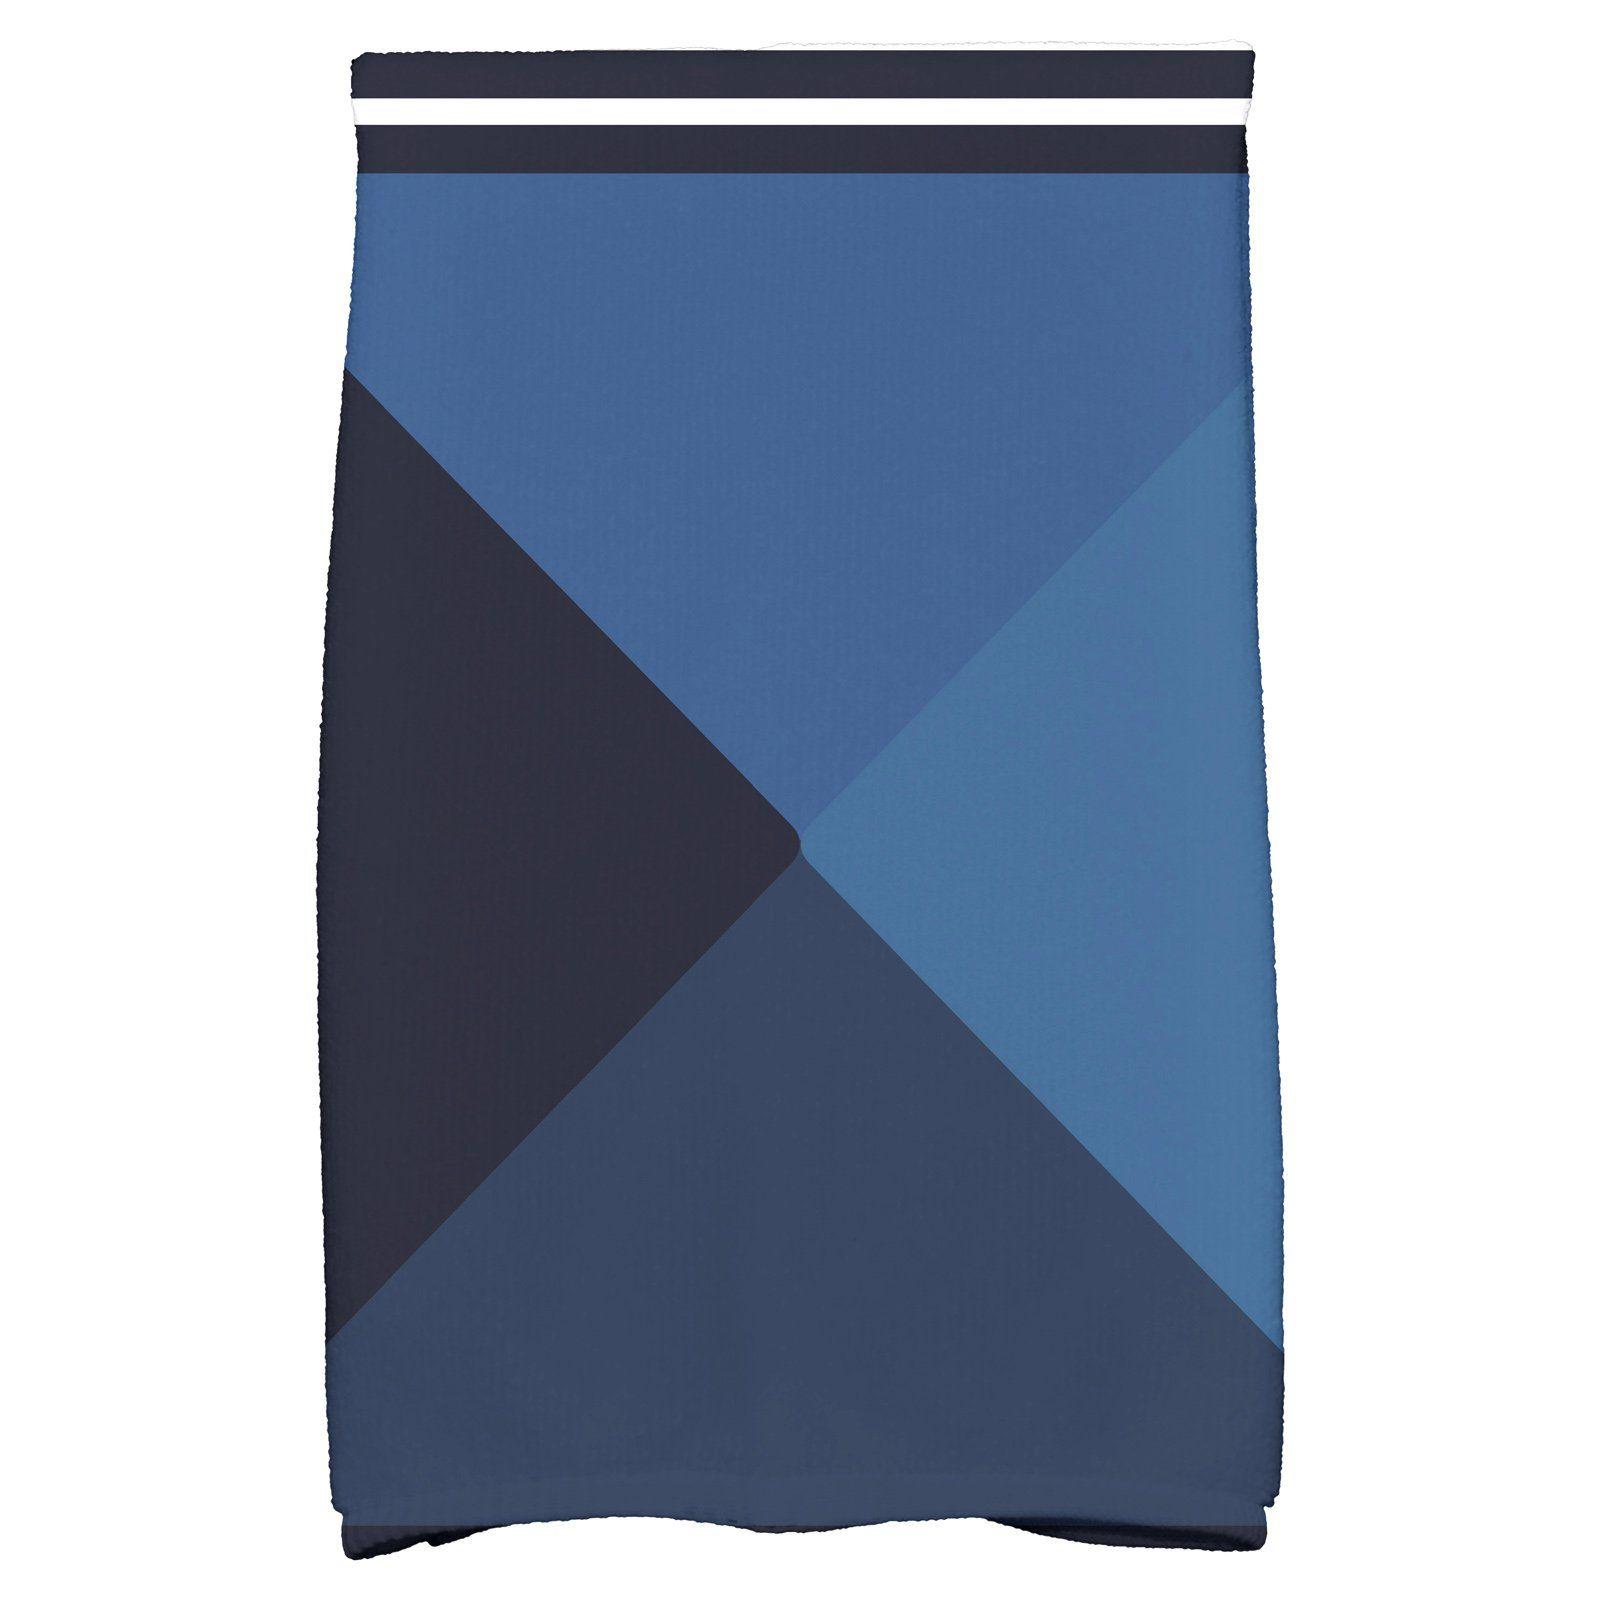 E by design nautical angles geometric print kitchen towel